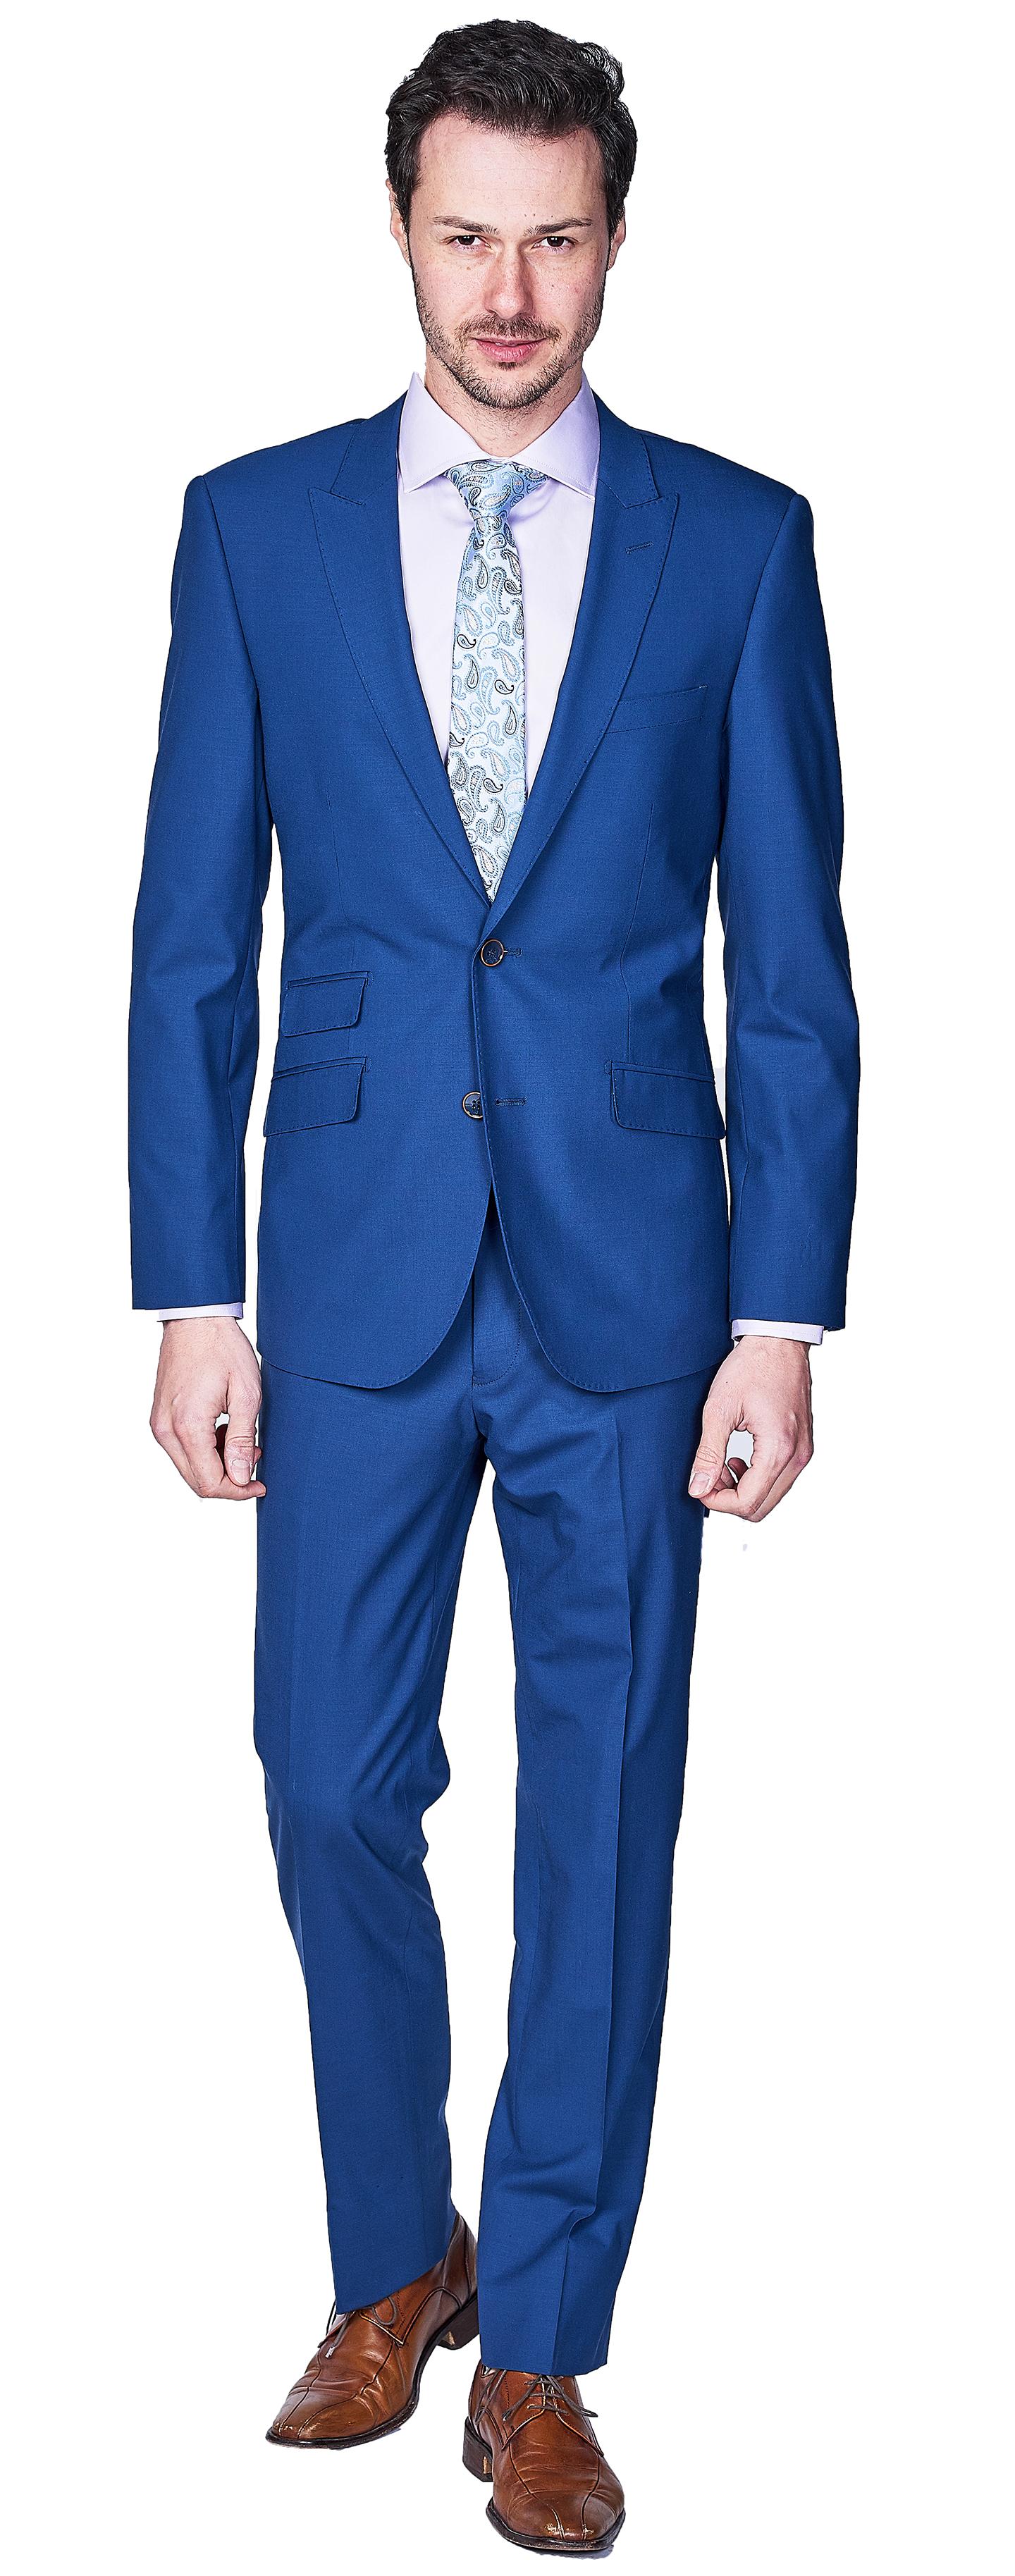 Giovanni Bresciani French Blue Peak SuitGB-263$850.00 USD.png